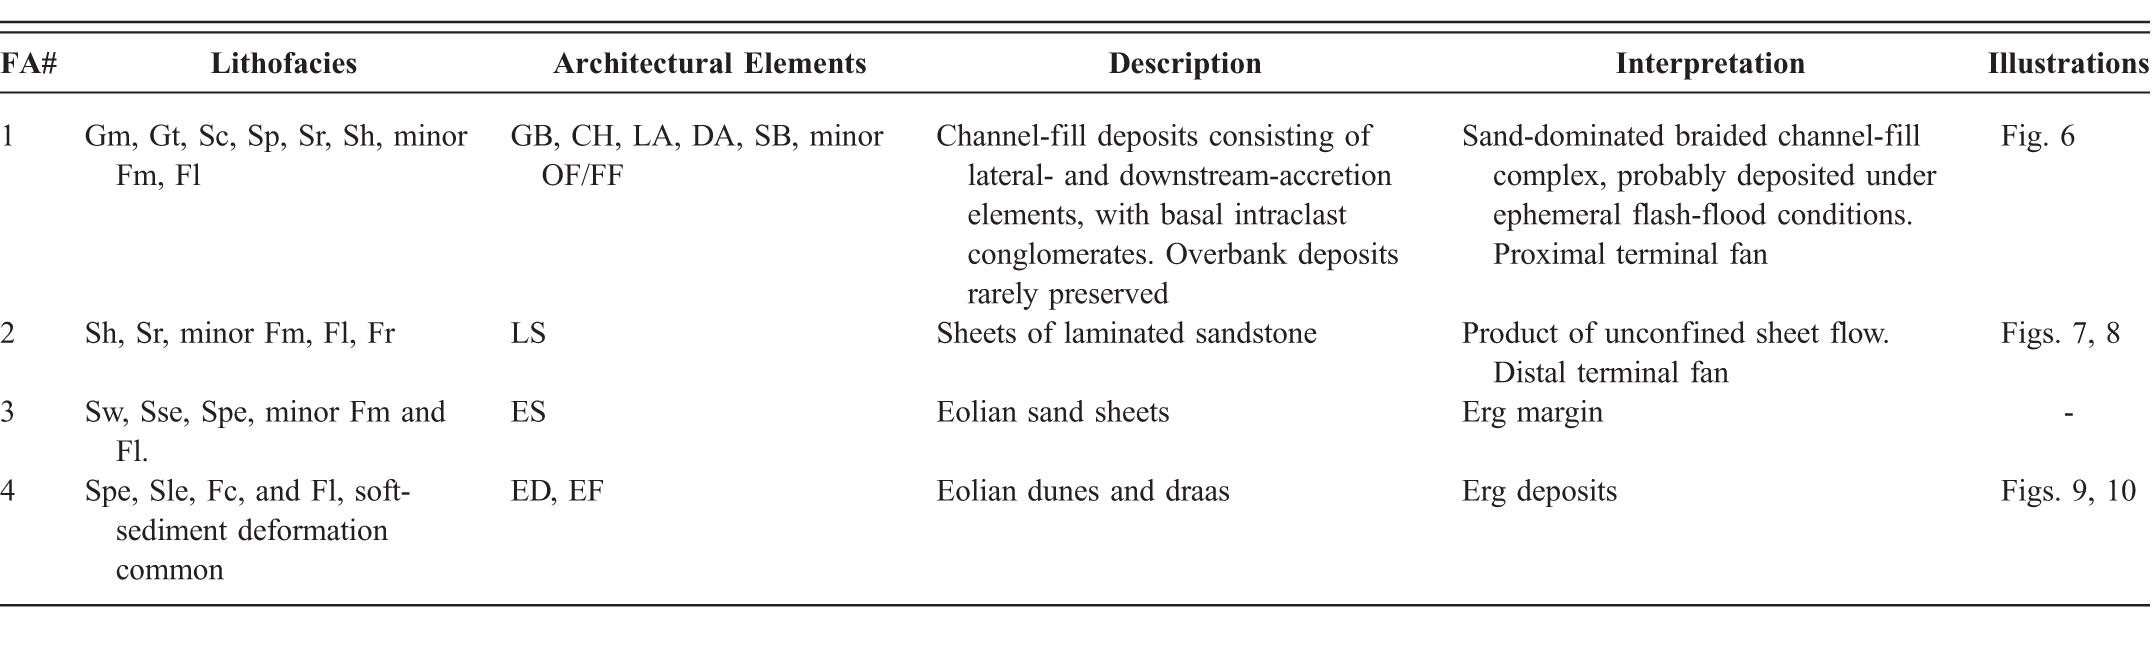 Sedimentology Of An Erg Margin The Kayentanavajo Transition Lower